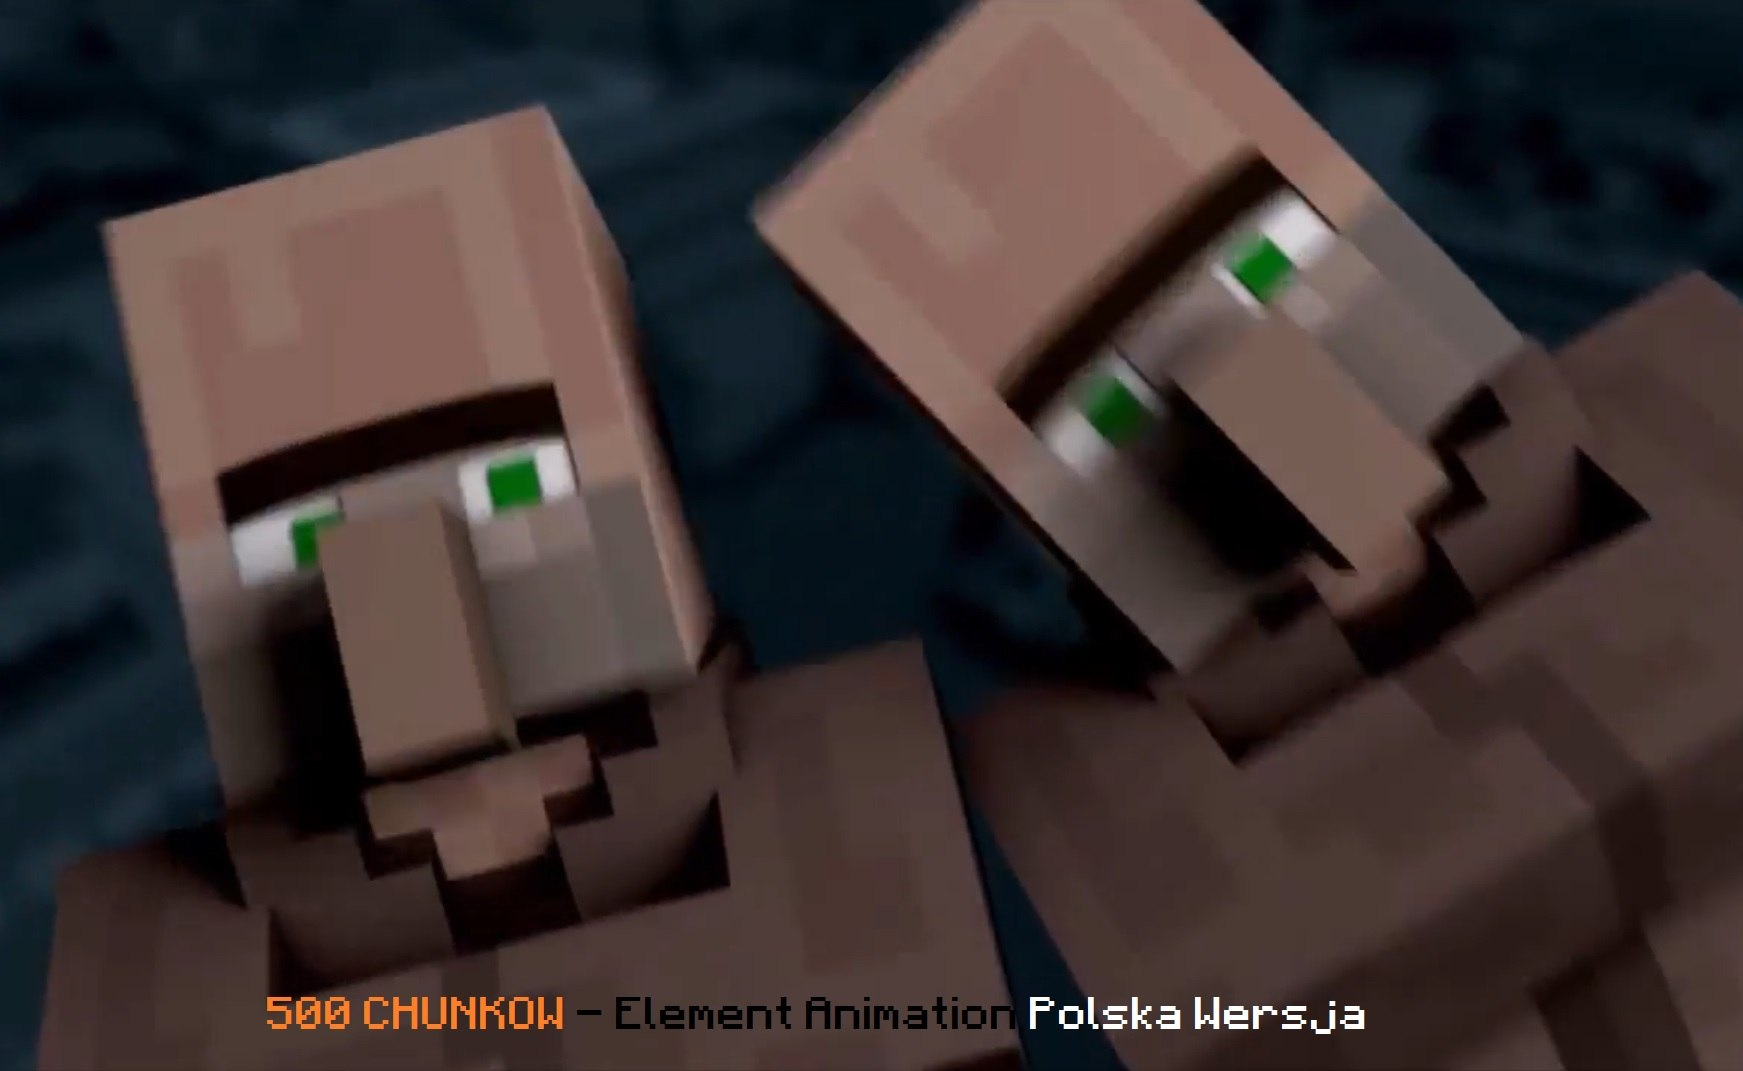 500-chunkow-element-animation